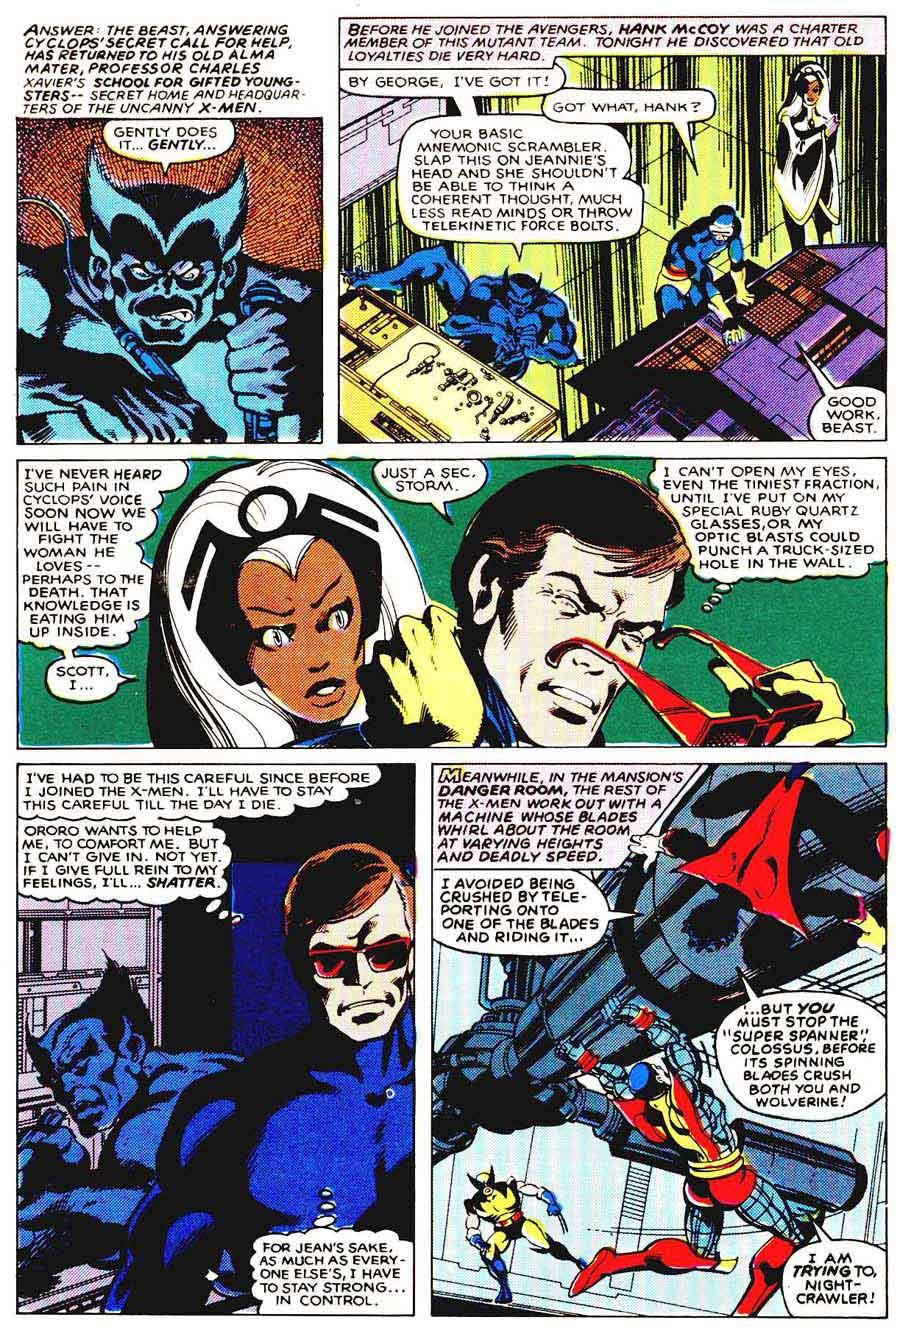 X-men v1 #136 marvel comic book page art by John Byrne